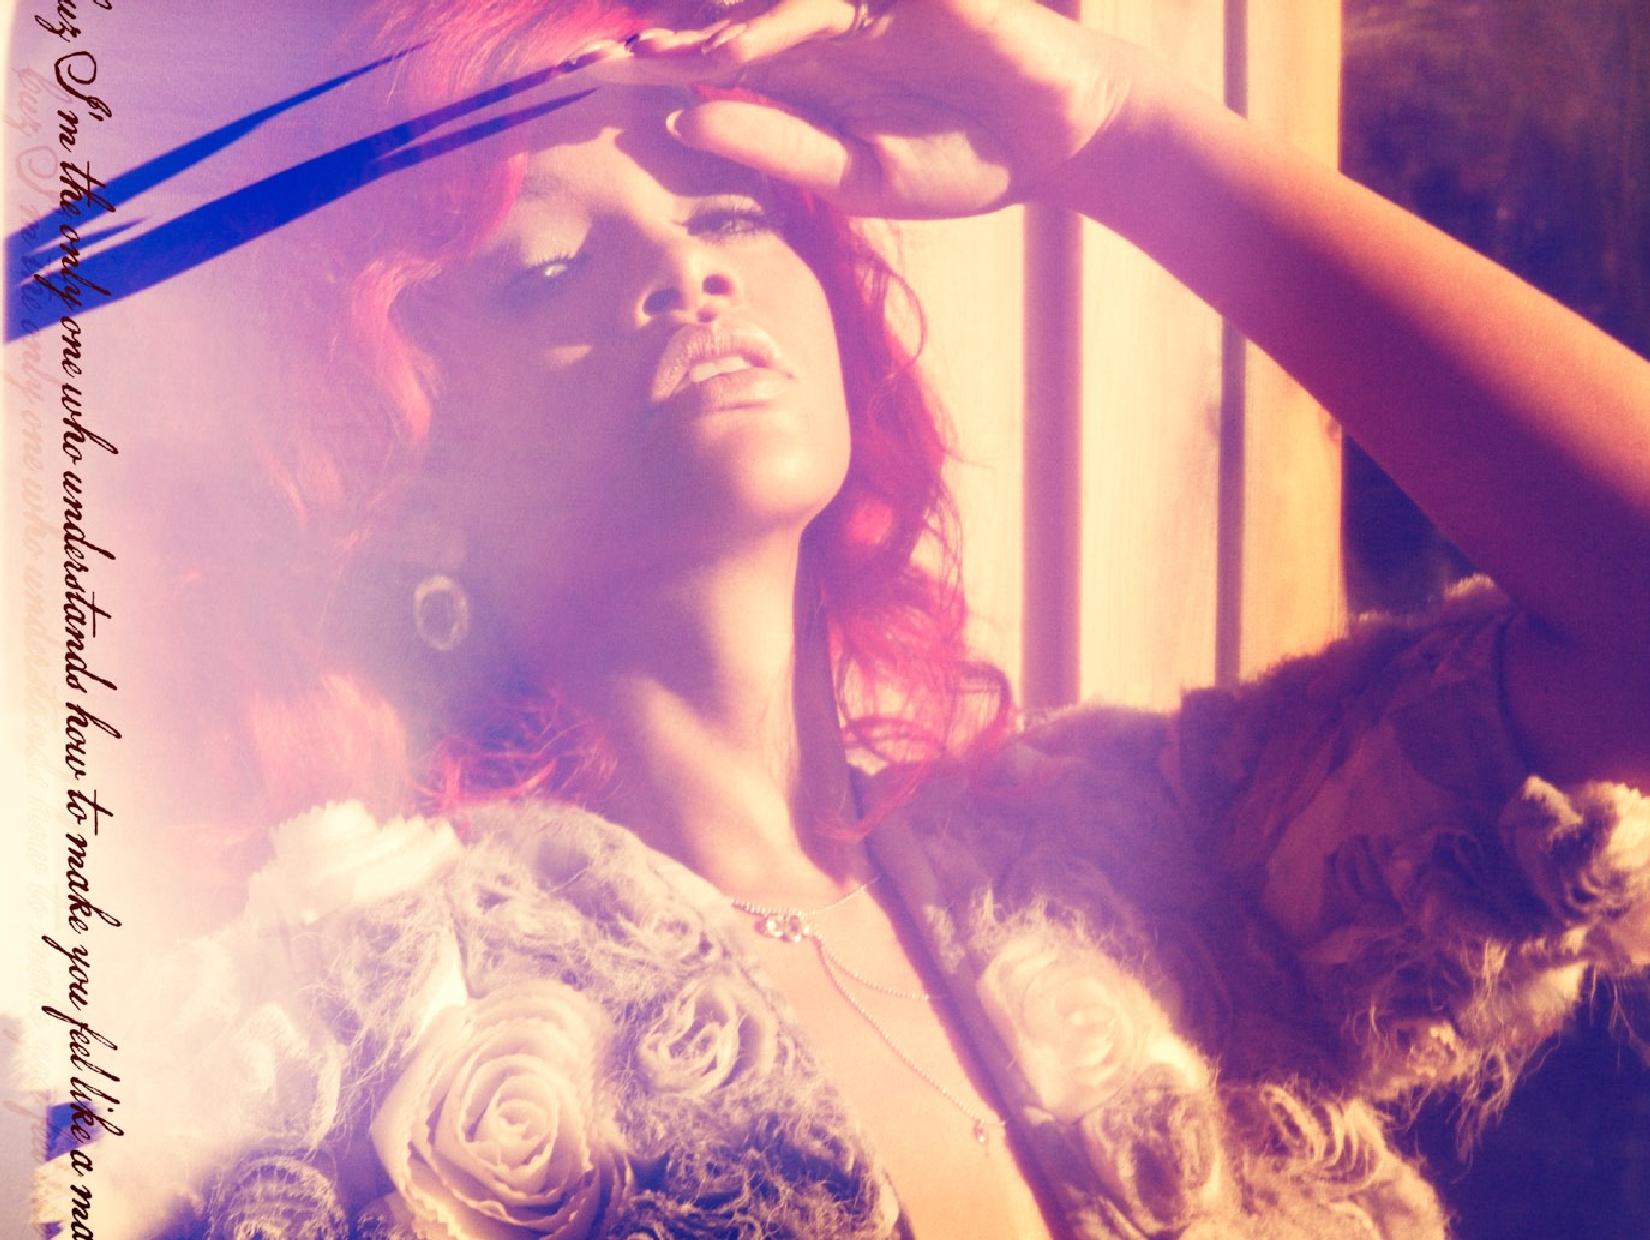 rihanna11 Rihannas Loud Album Unwrapped